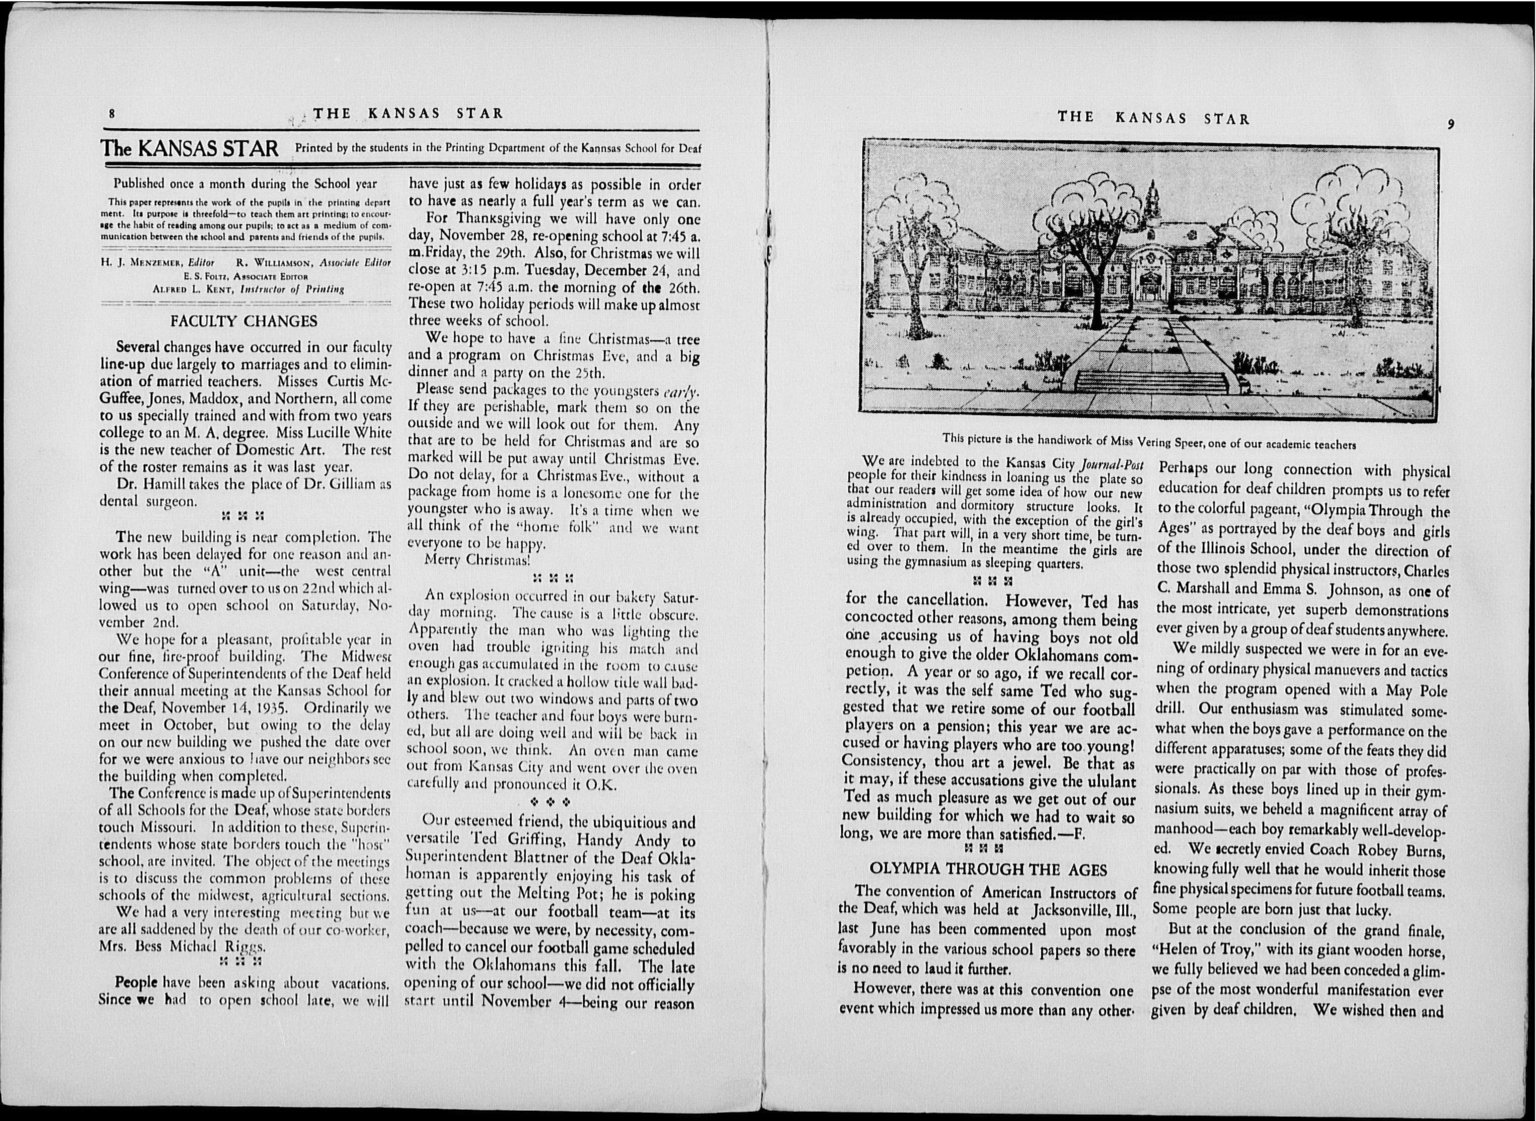 The Kansas Star, volume 50, number 1 - 8-9